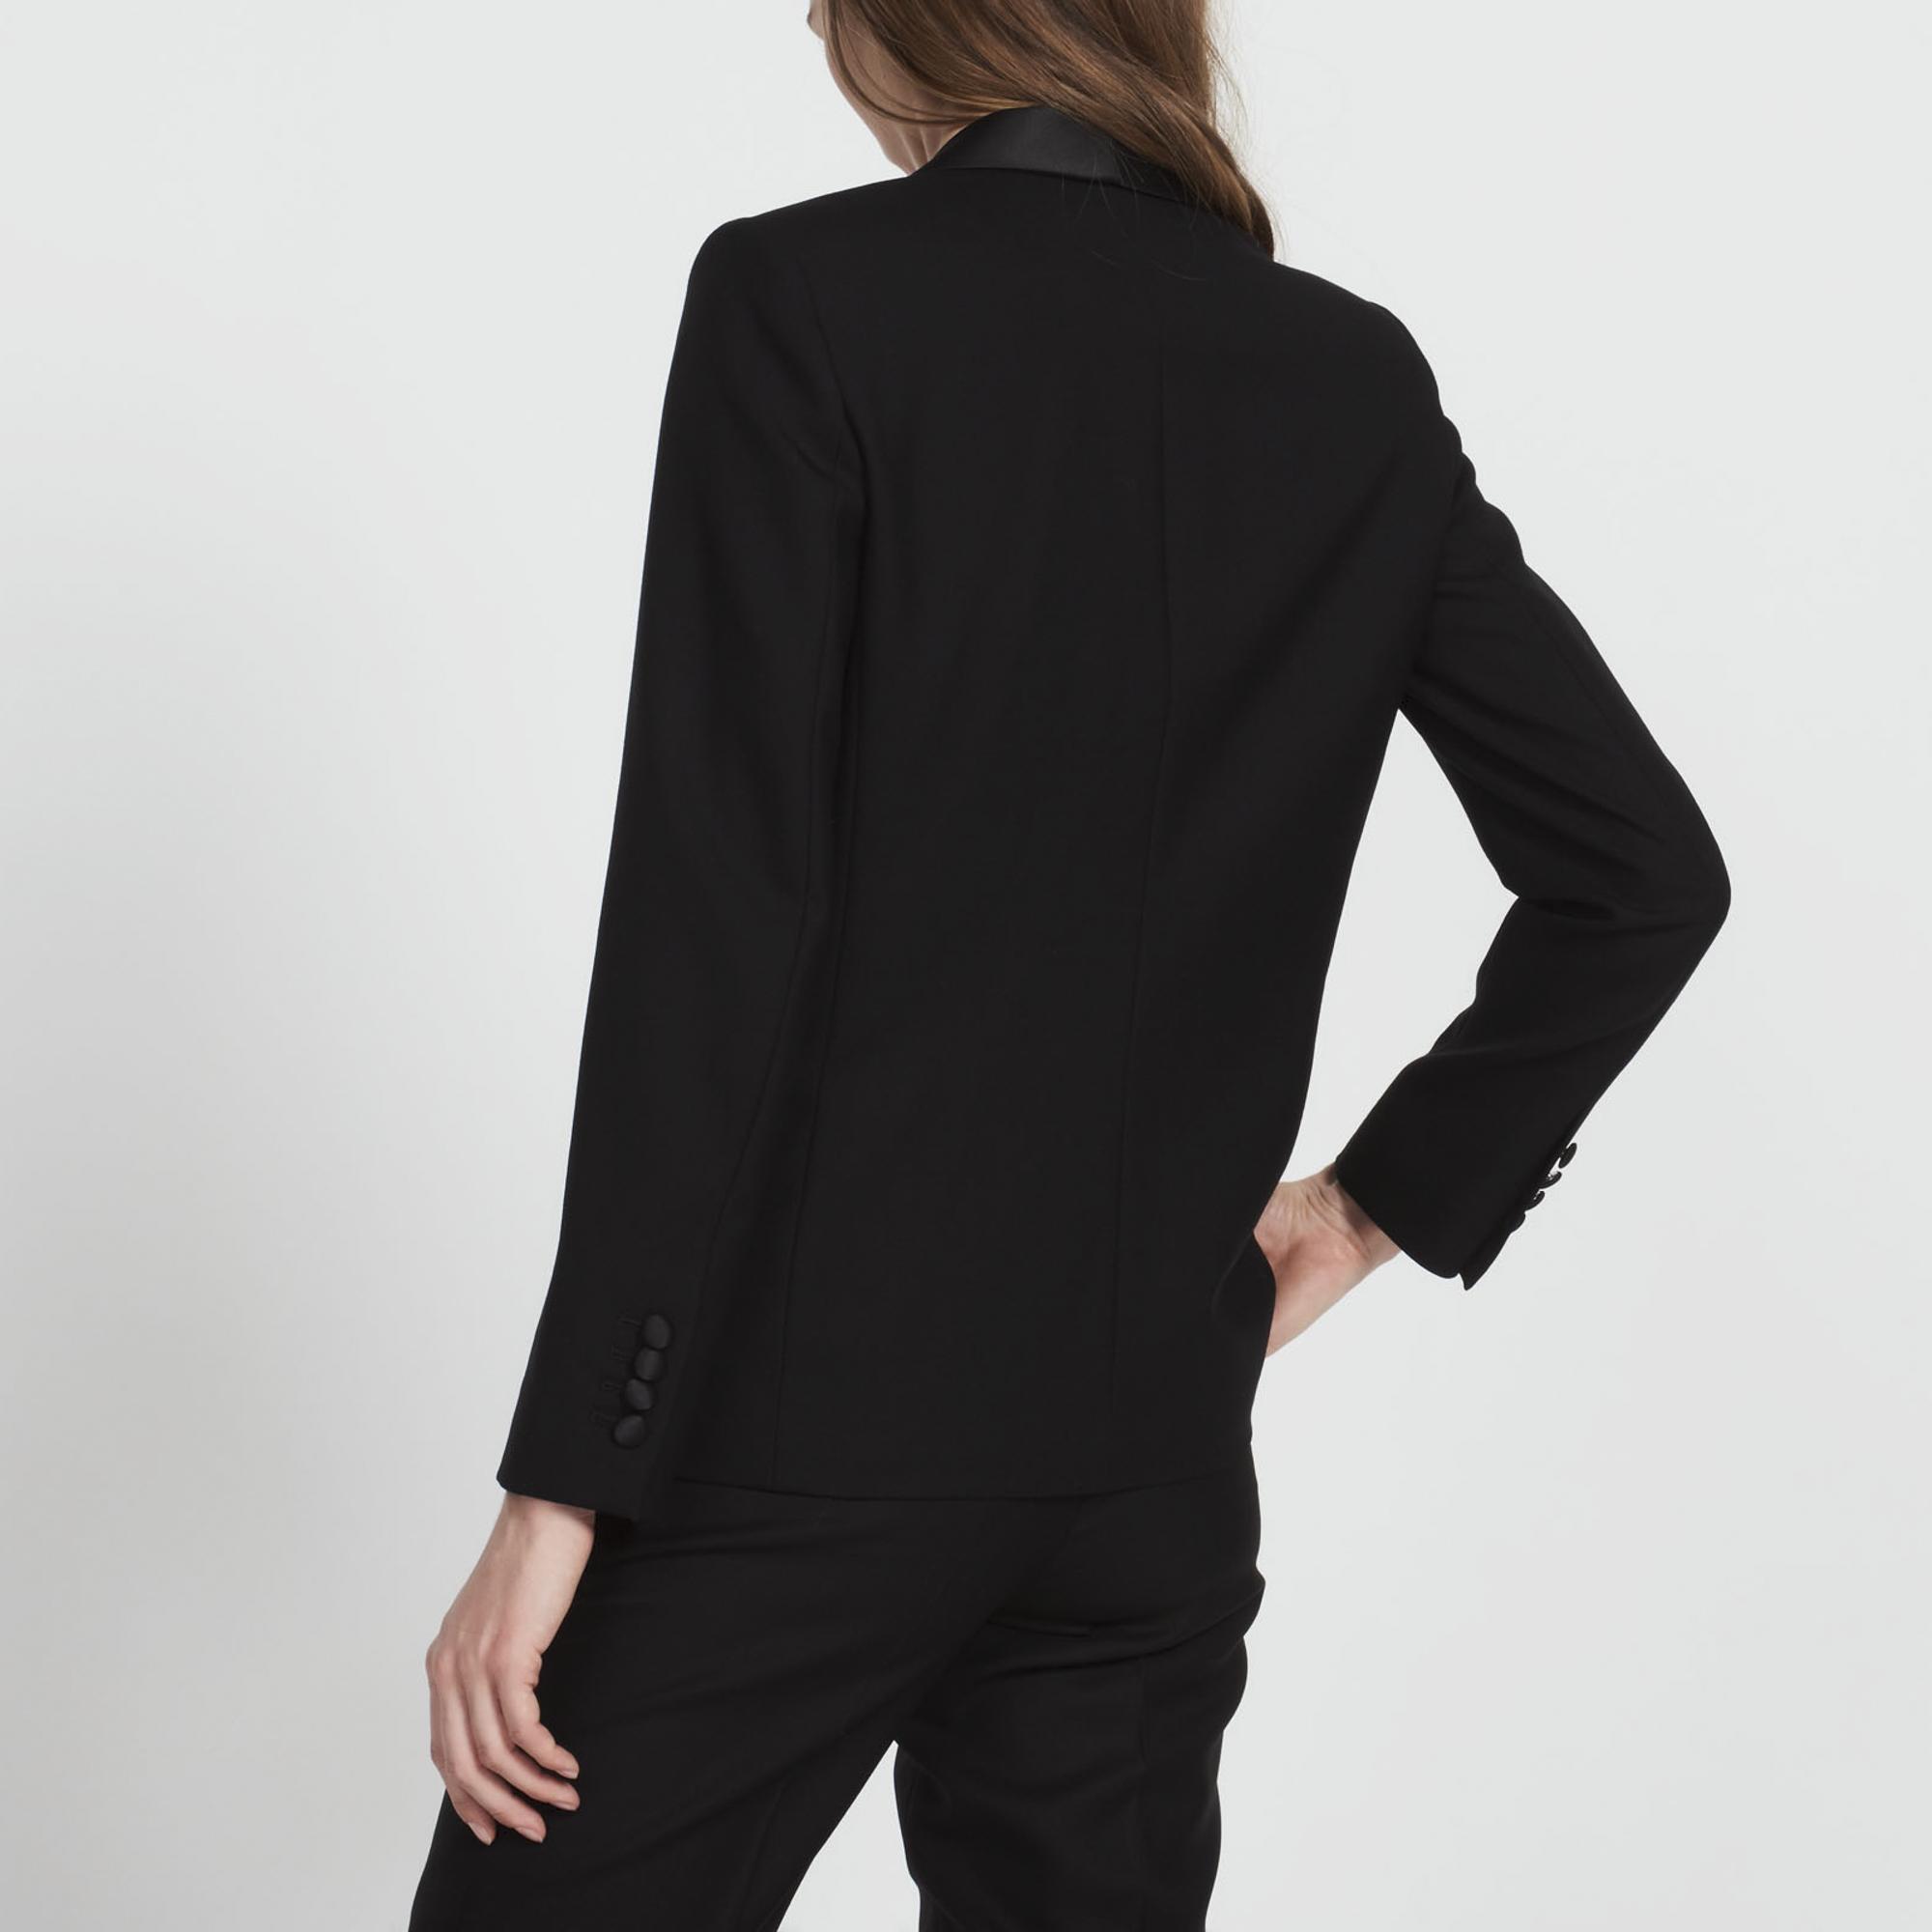 voguy blousons vestes sandro paris. Black Bedroom Furniture Sets. Home Design Ideas